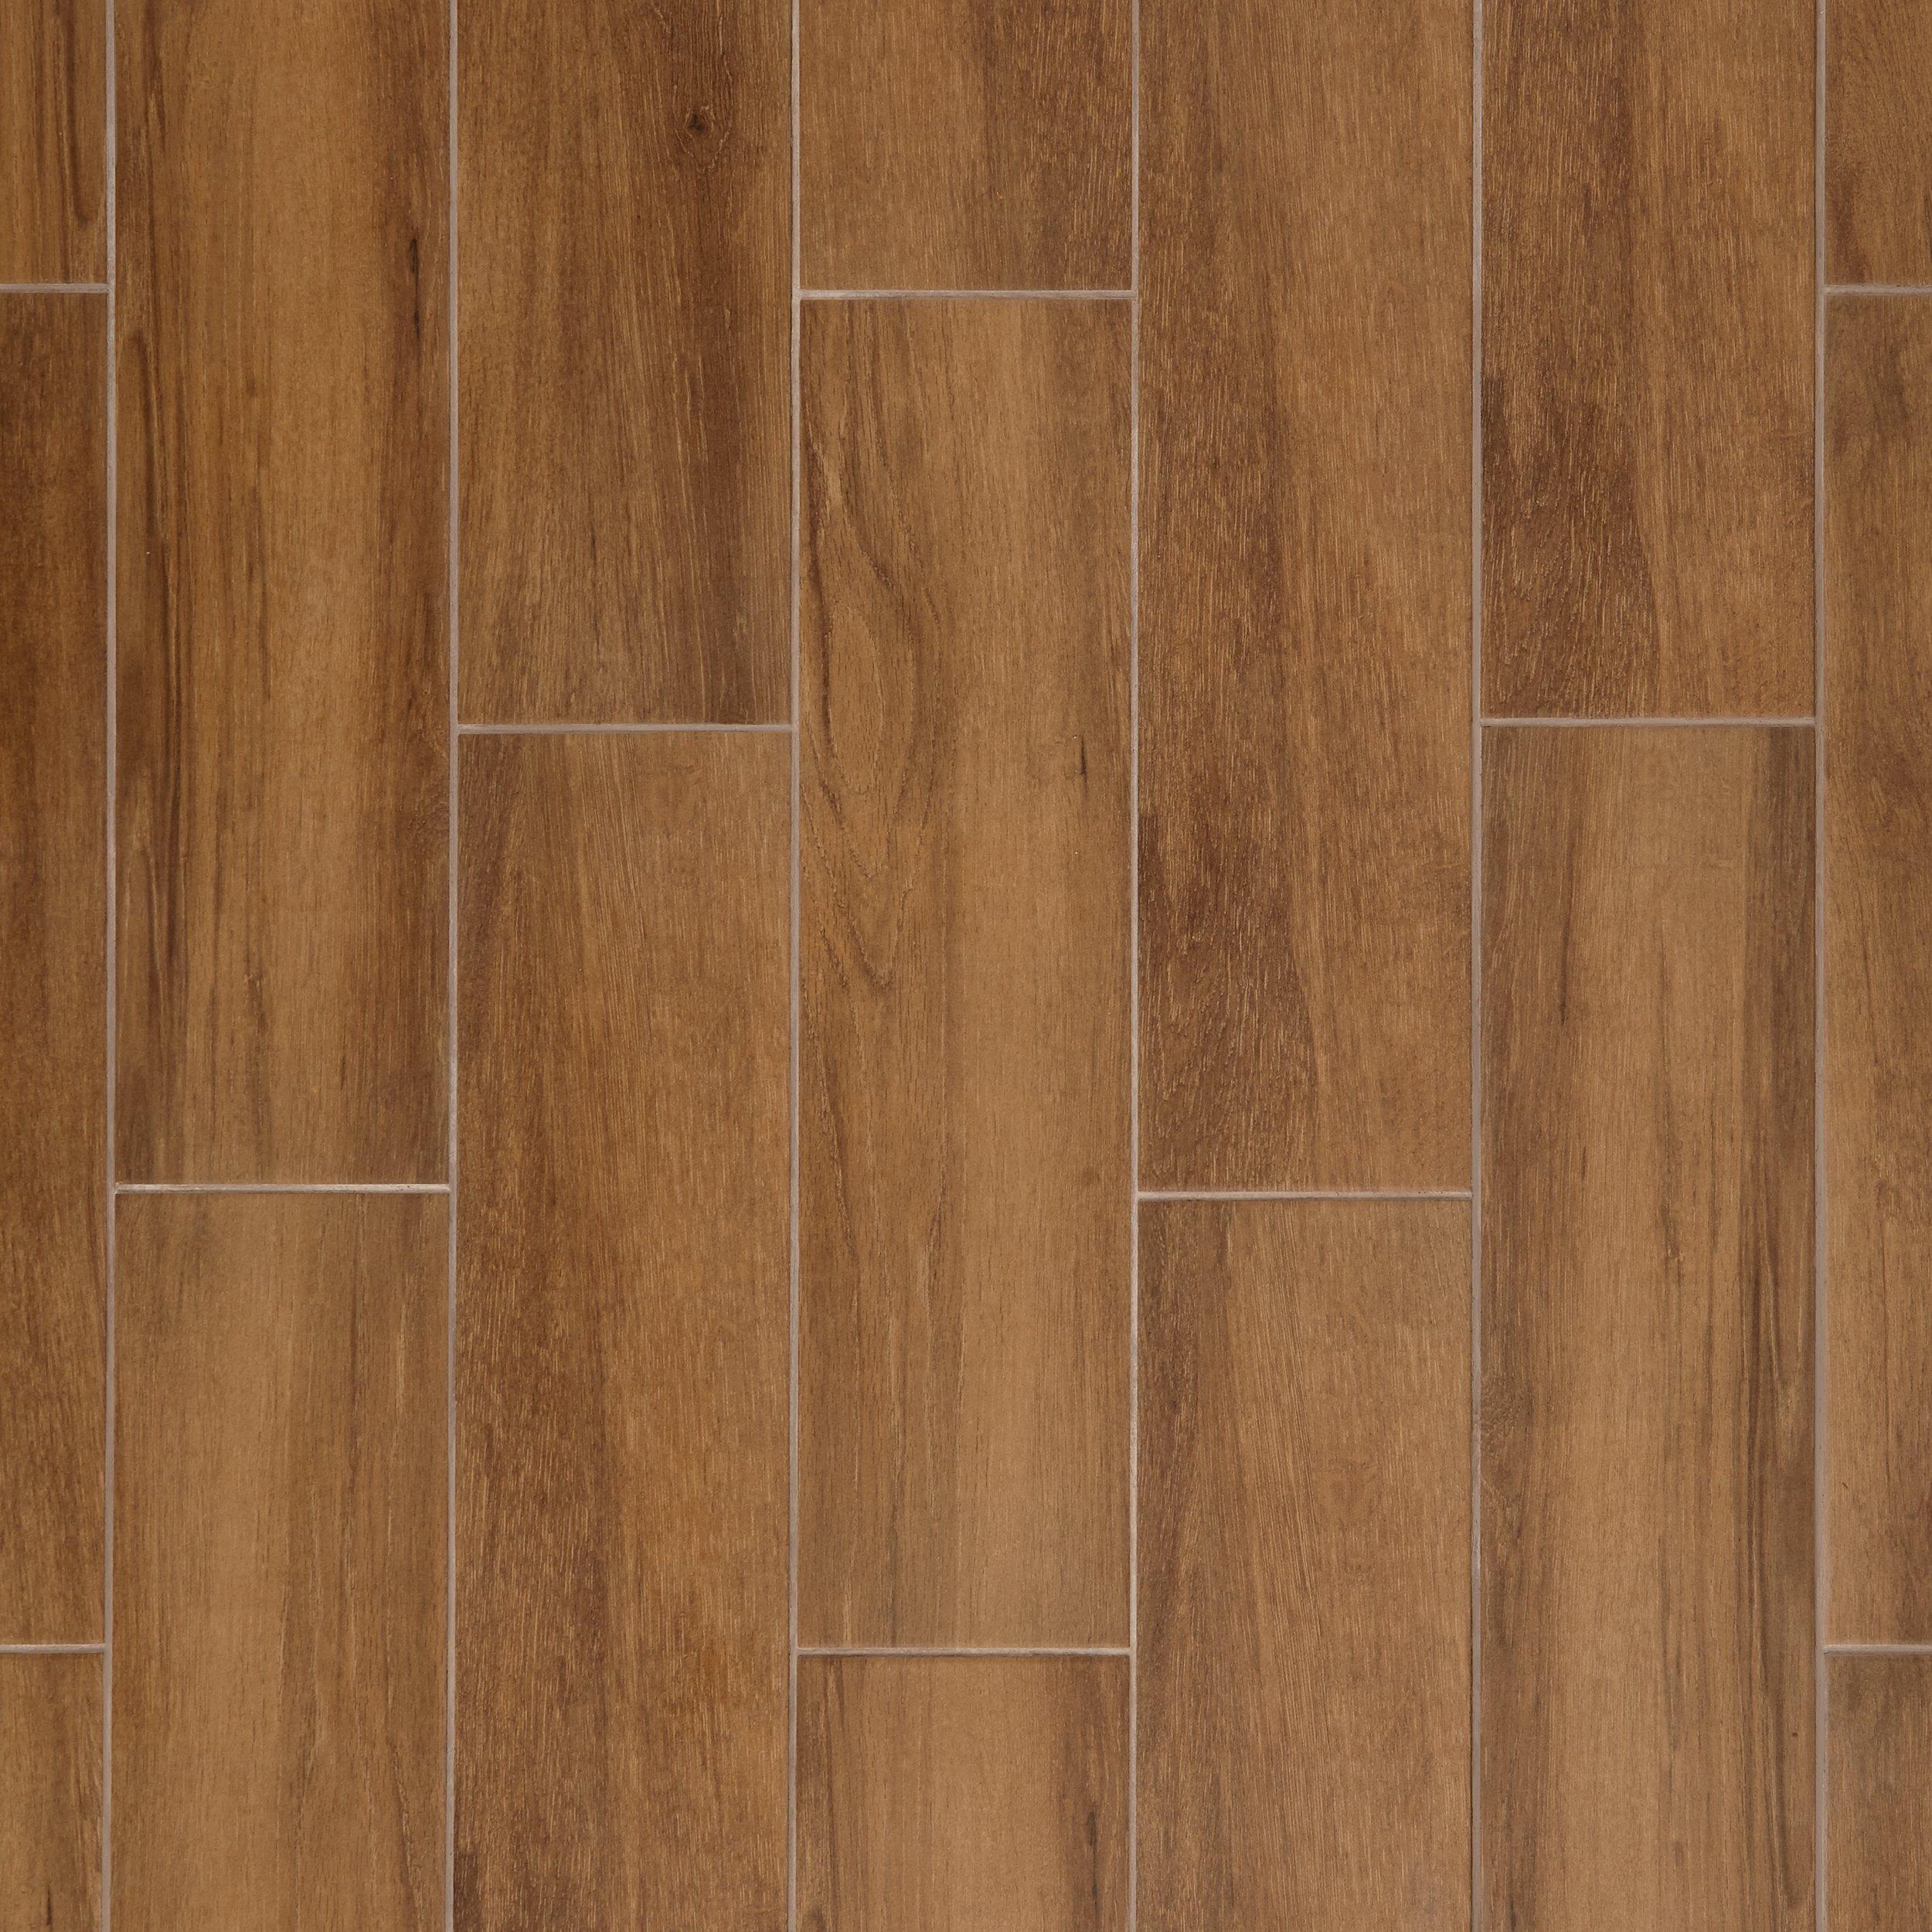 Genial Floor U0026 Decor